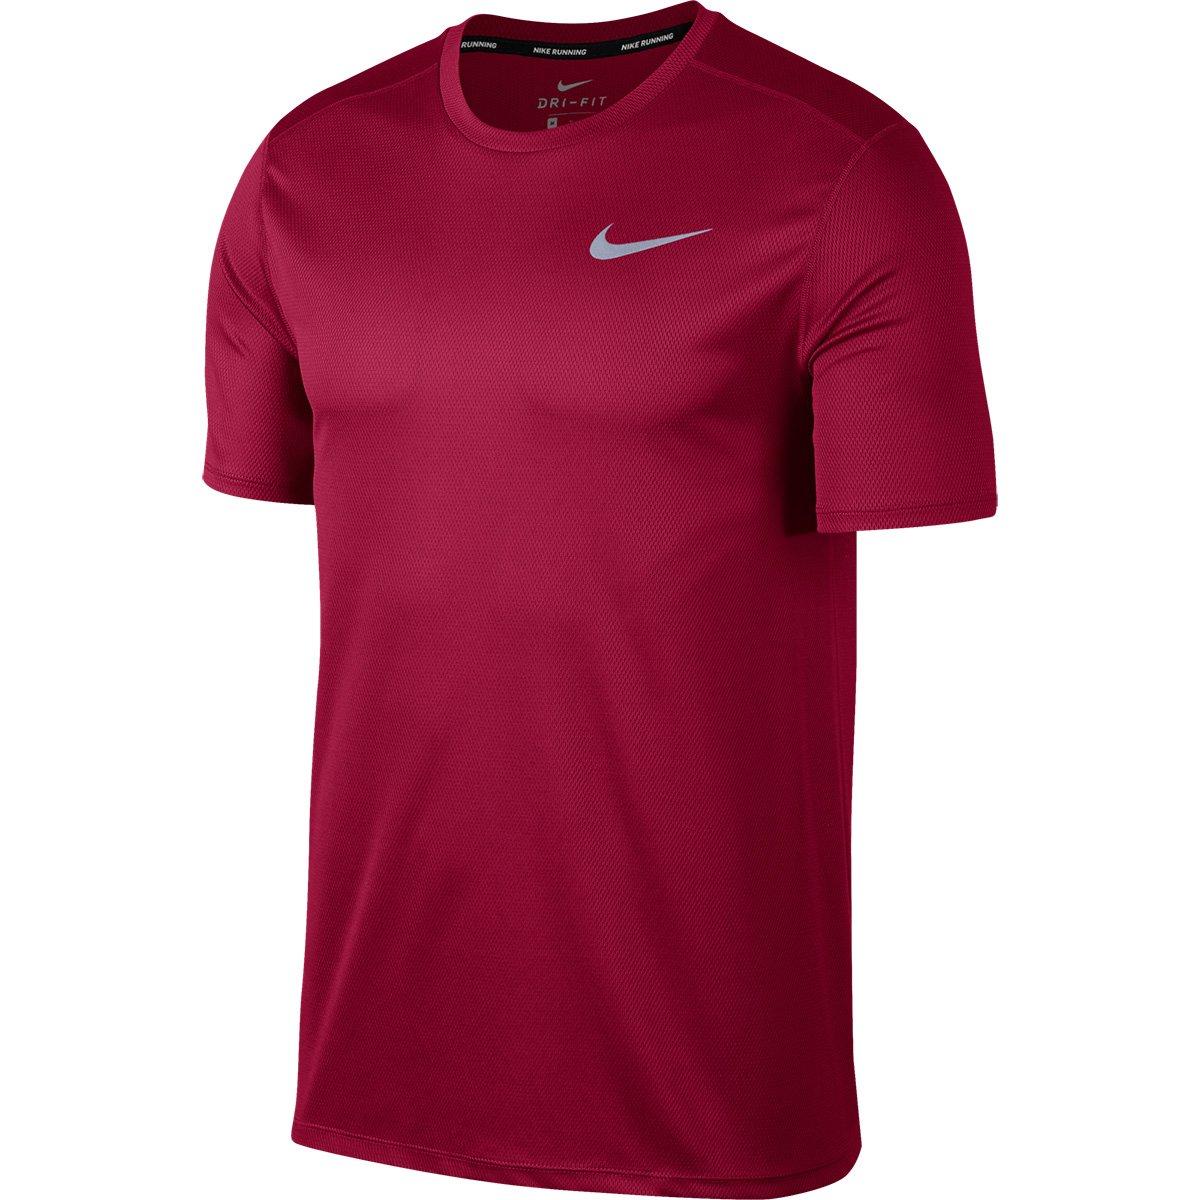 trono Magistrado Arsenal  Camiseta Nike DRI-FIT Run Masculina | Netshoes